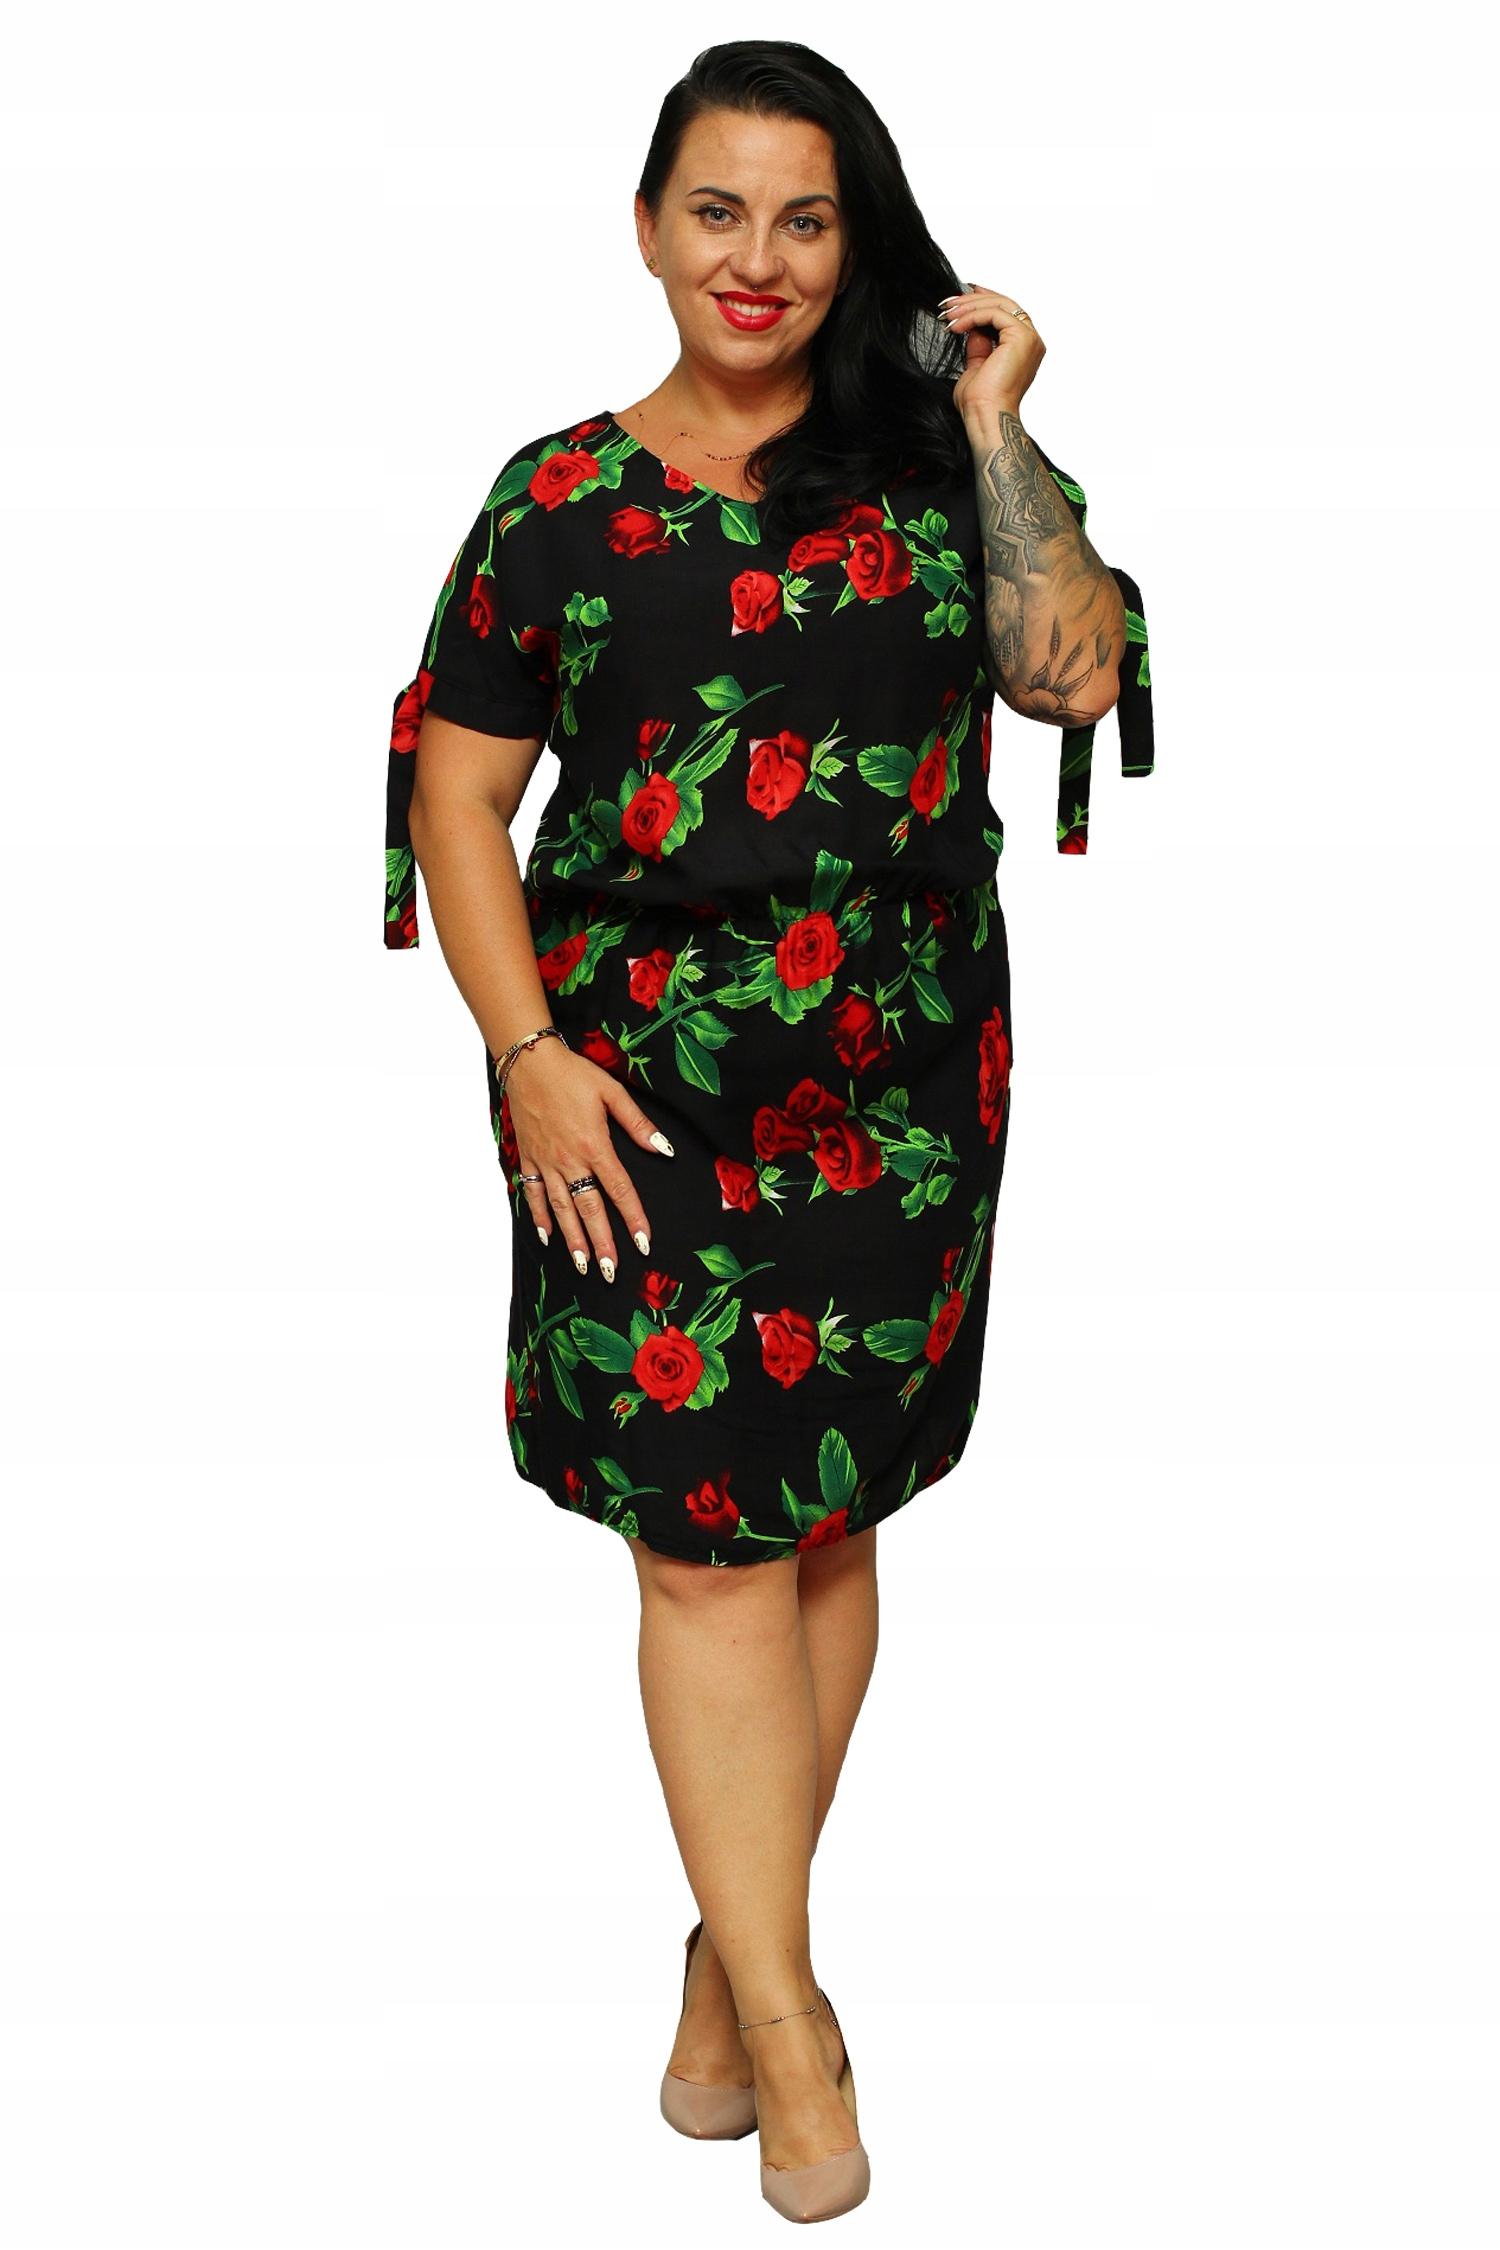 1f97267d6f Sukienka JUSTYNA gumka czarna róże 46 - 7535450987 - oficjalne ...